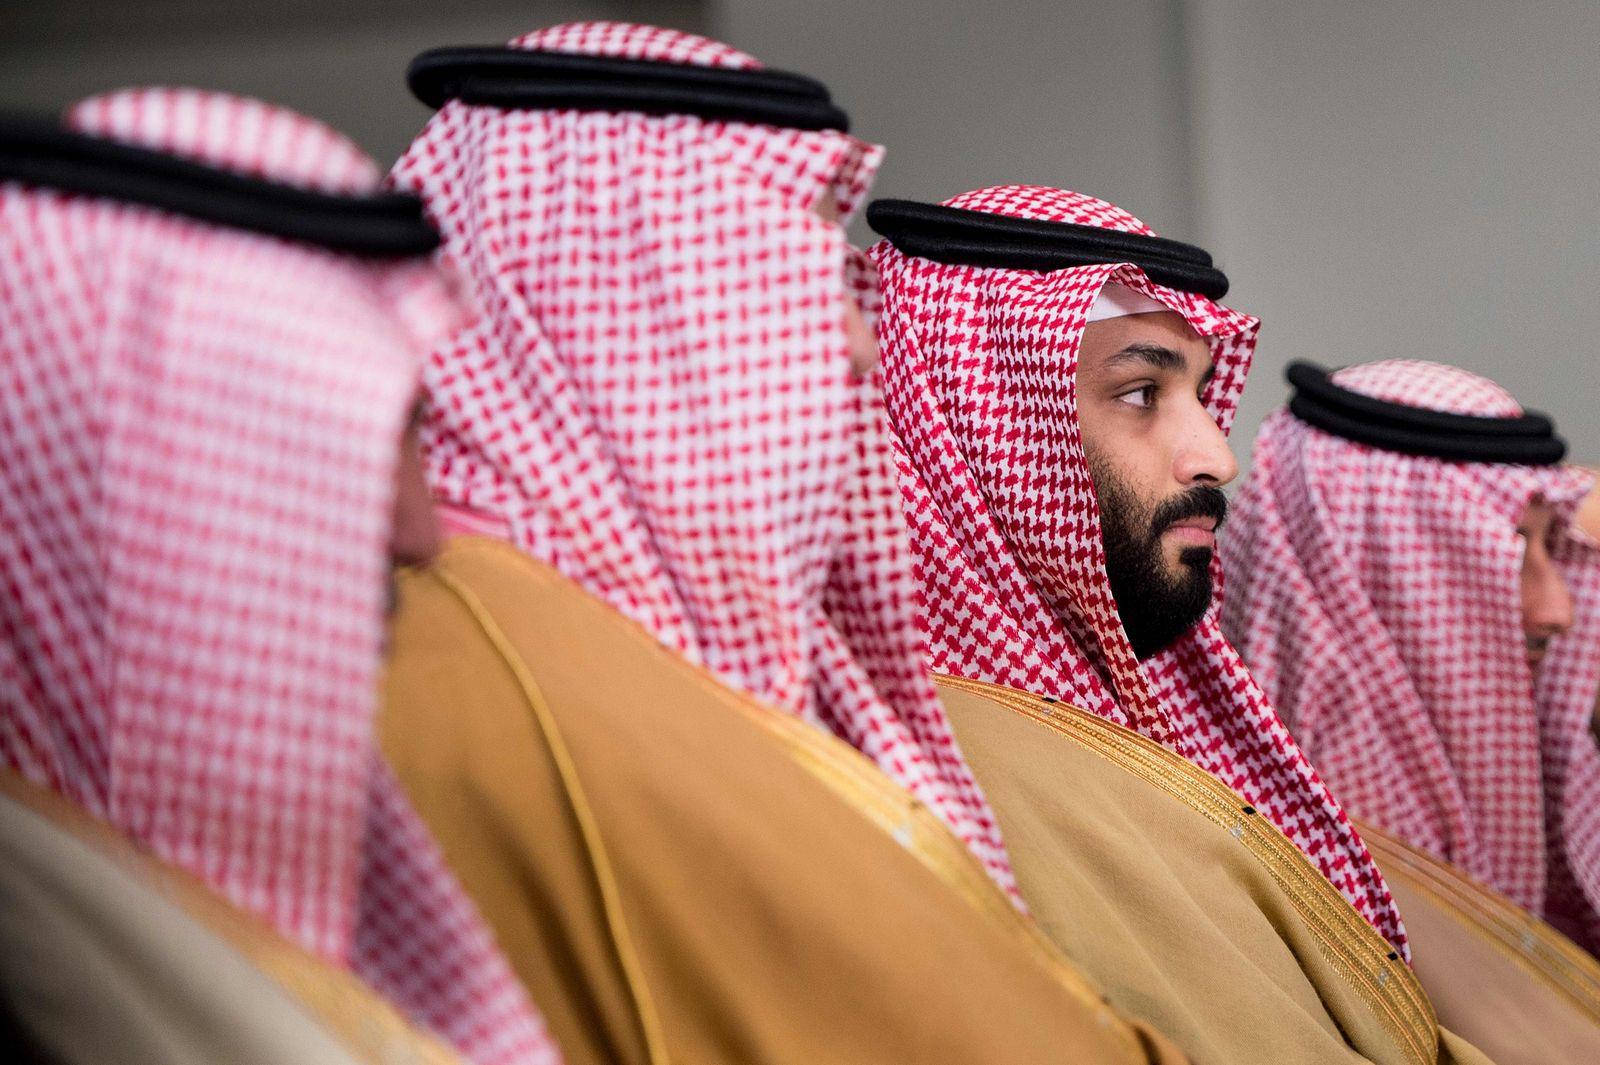 US Defense Secretary Jim Mattis welcomes Saudi Crown Prince Mohammad Bin Salman to the Pentagon